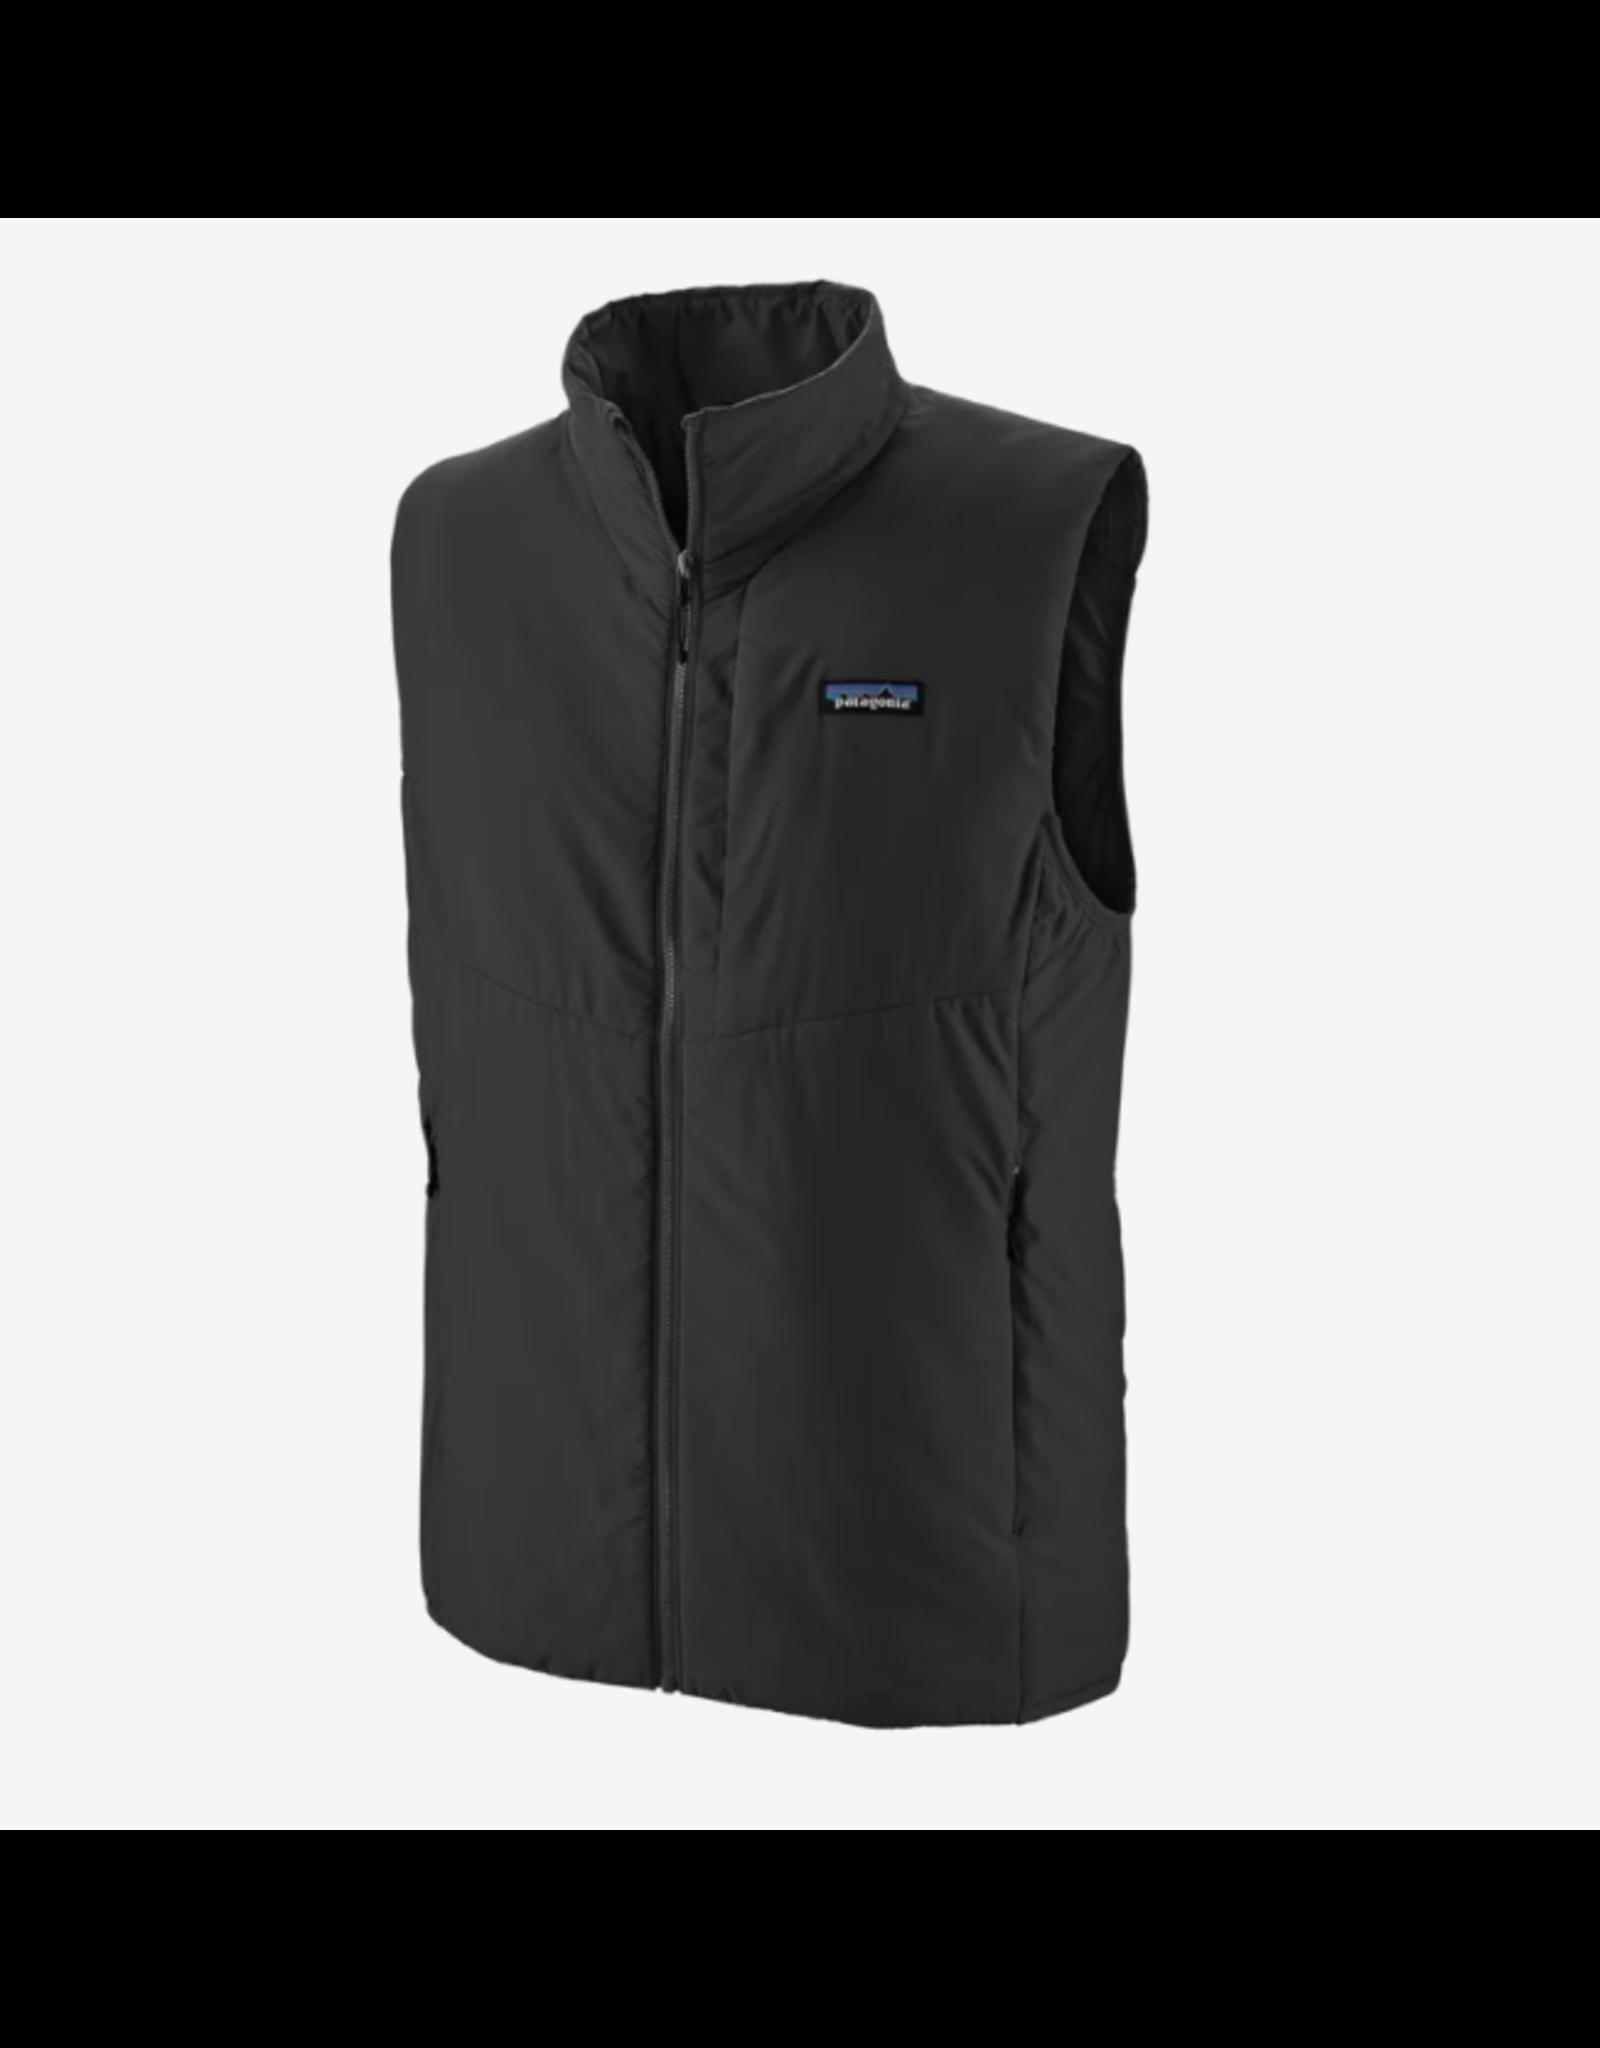 Patagonia Nano Air Vest (BLK) *Sample Sale Size Large